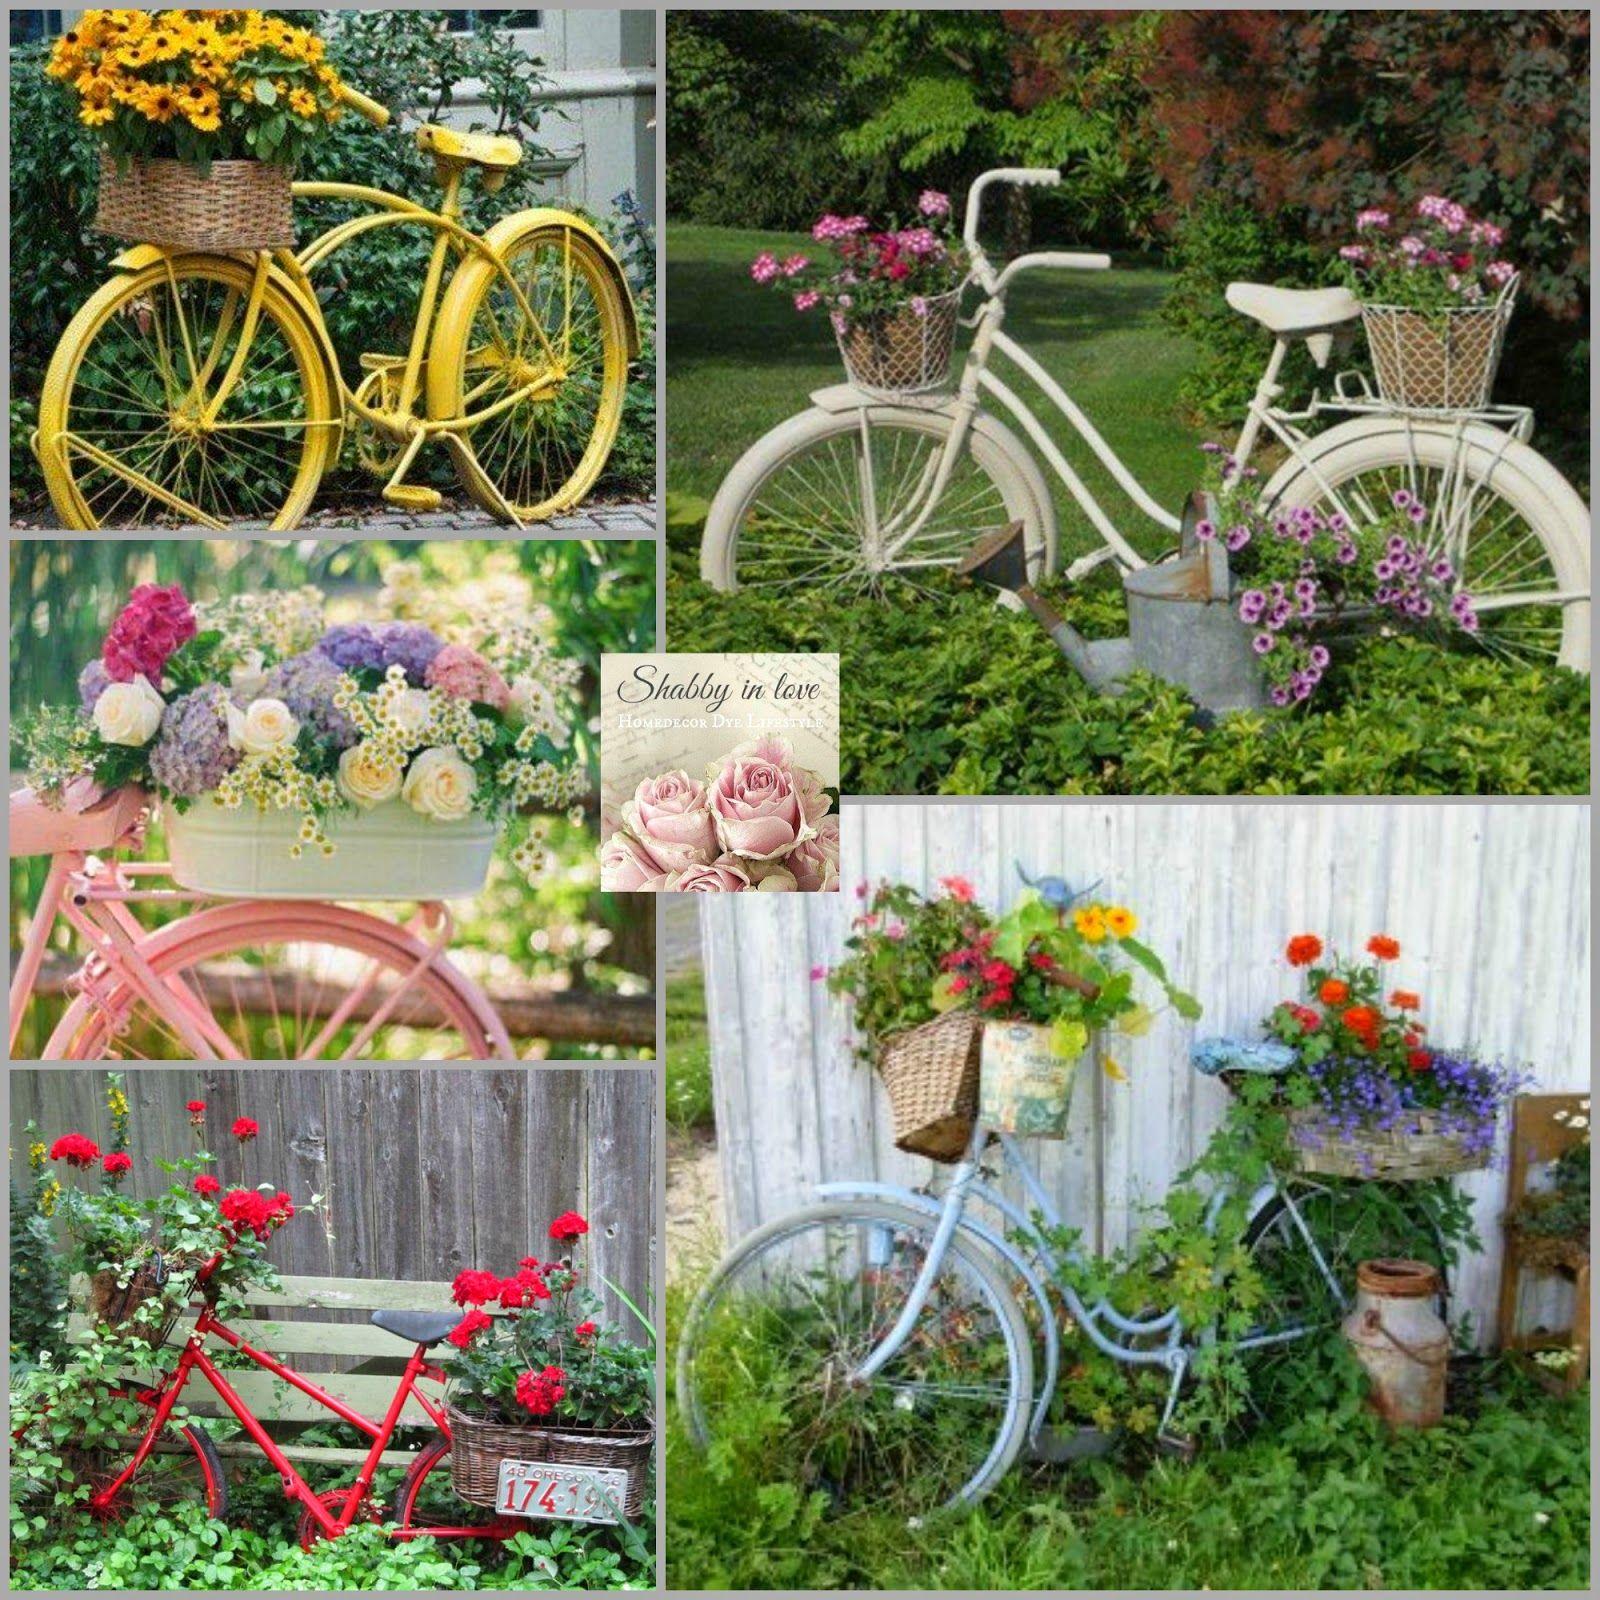 Pixeles ideas para el hogar pinterest bicicleta jardines y jard n - Hogar y jardin castellon ...